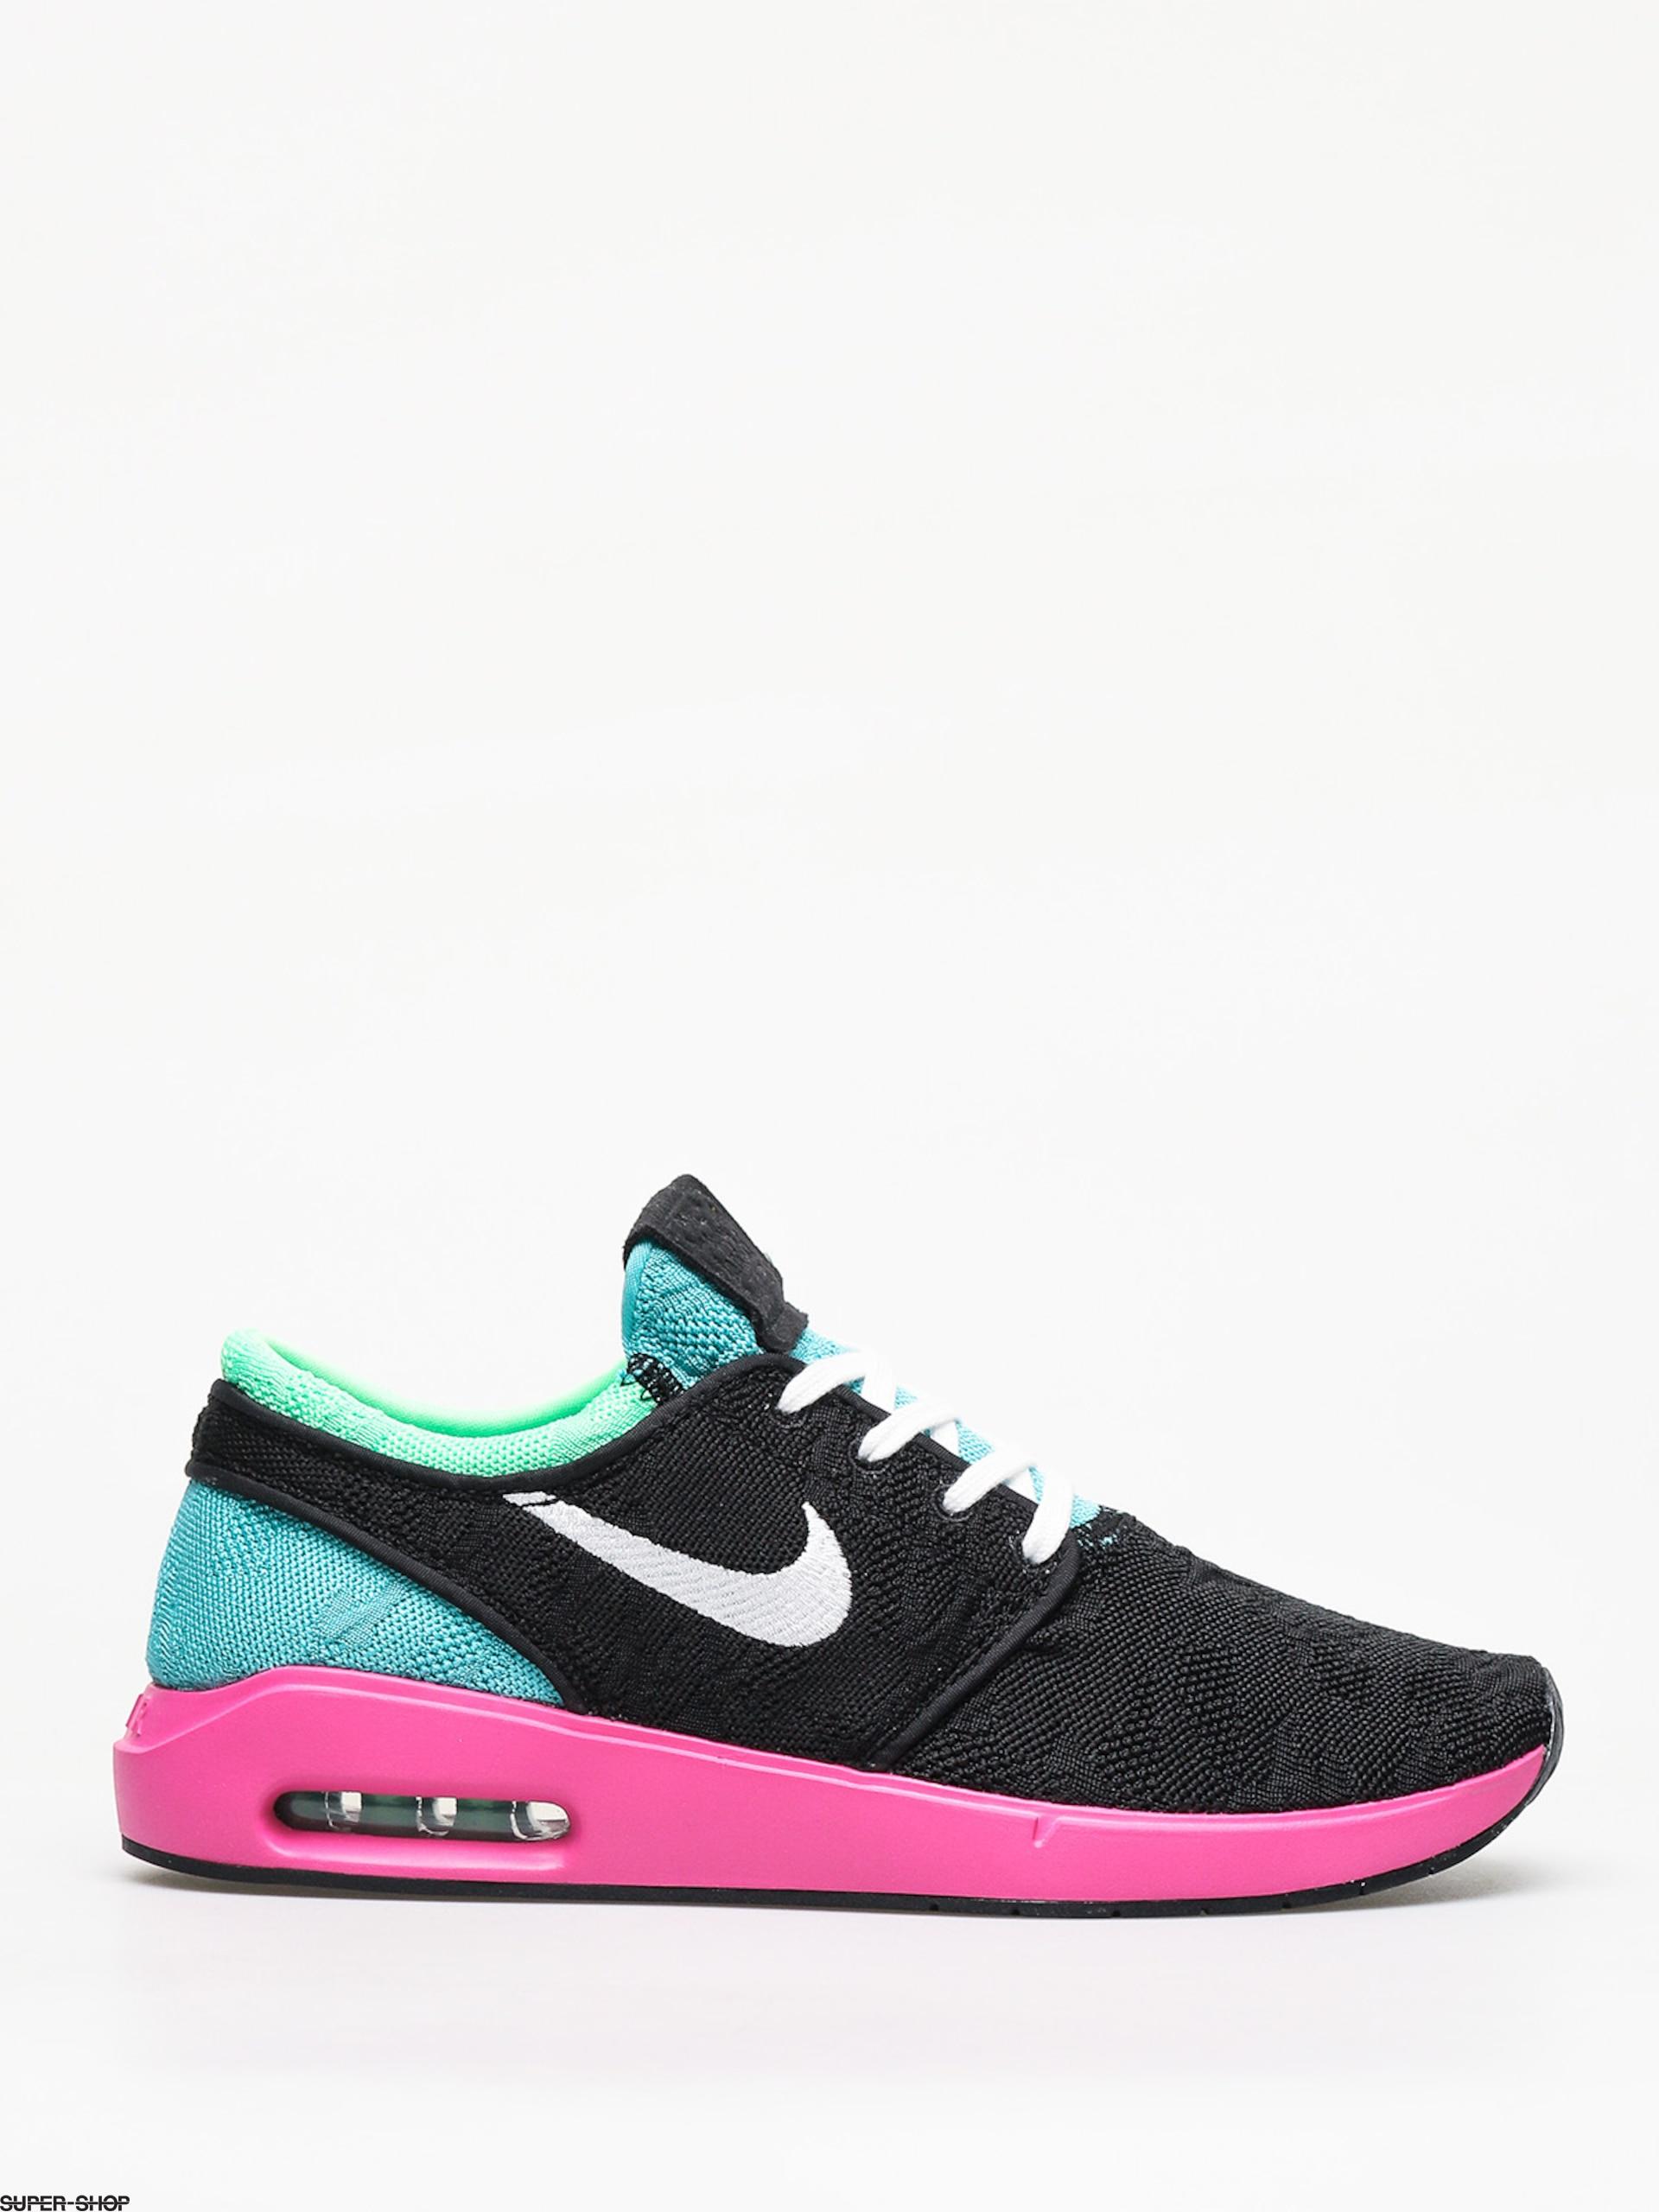 Nike SB Air Max Janoski 2 Shoes (blackwhite cabana electro green)